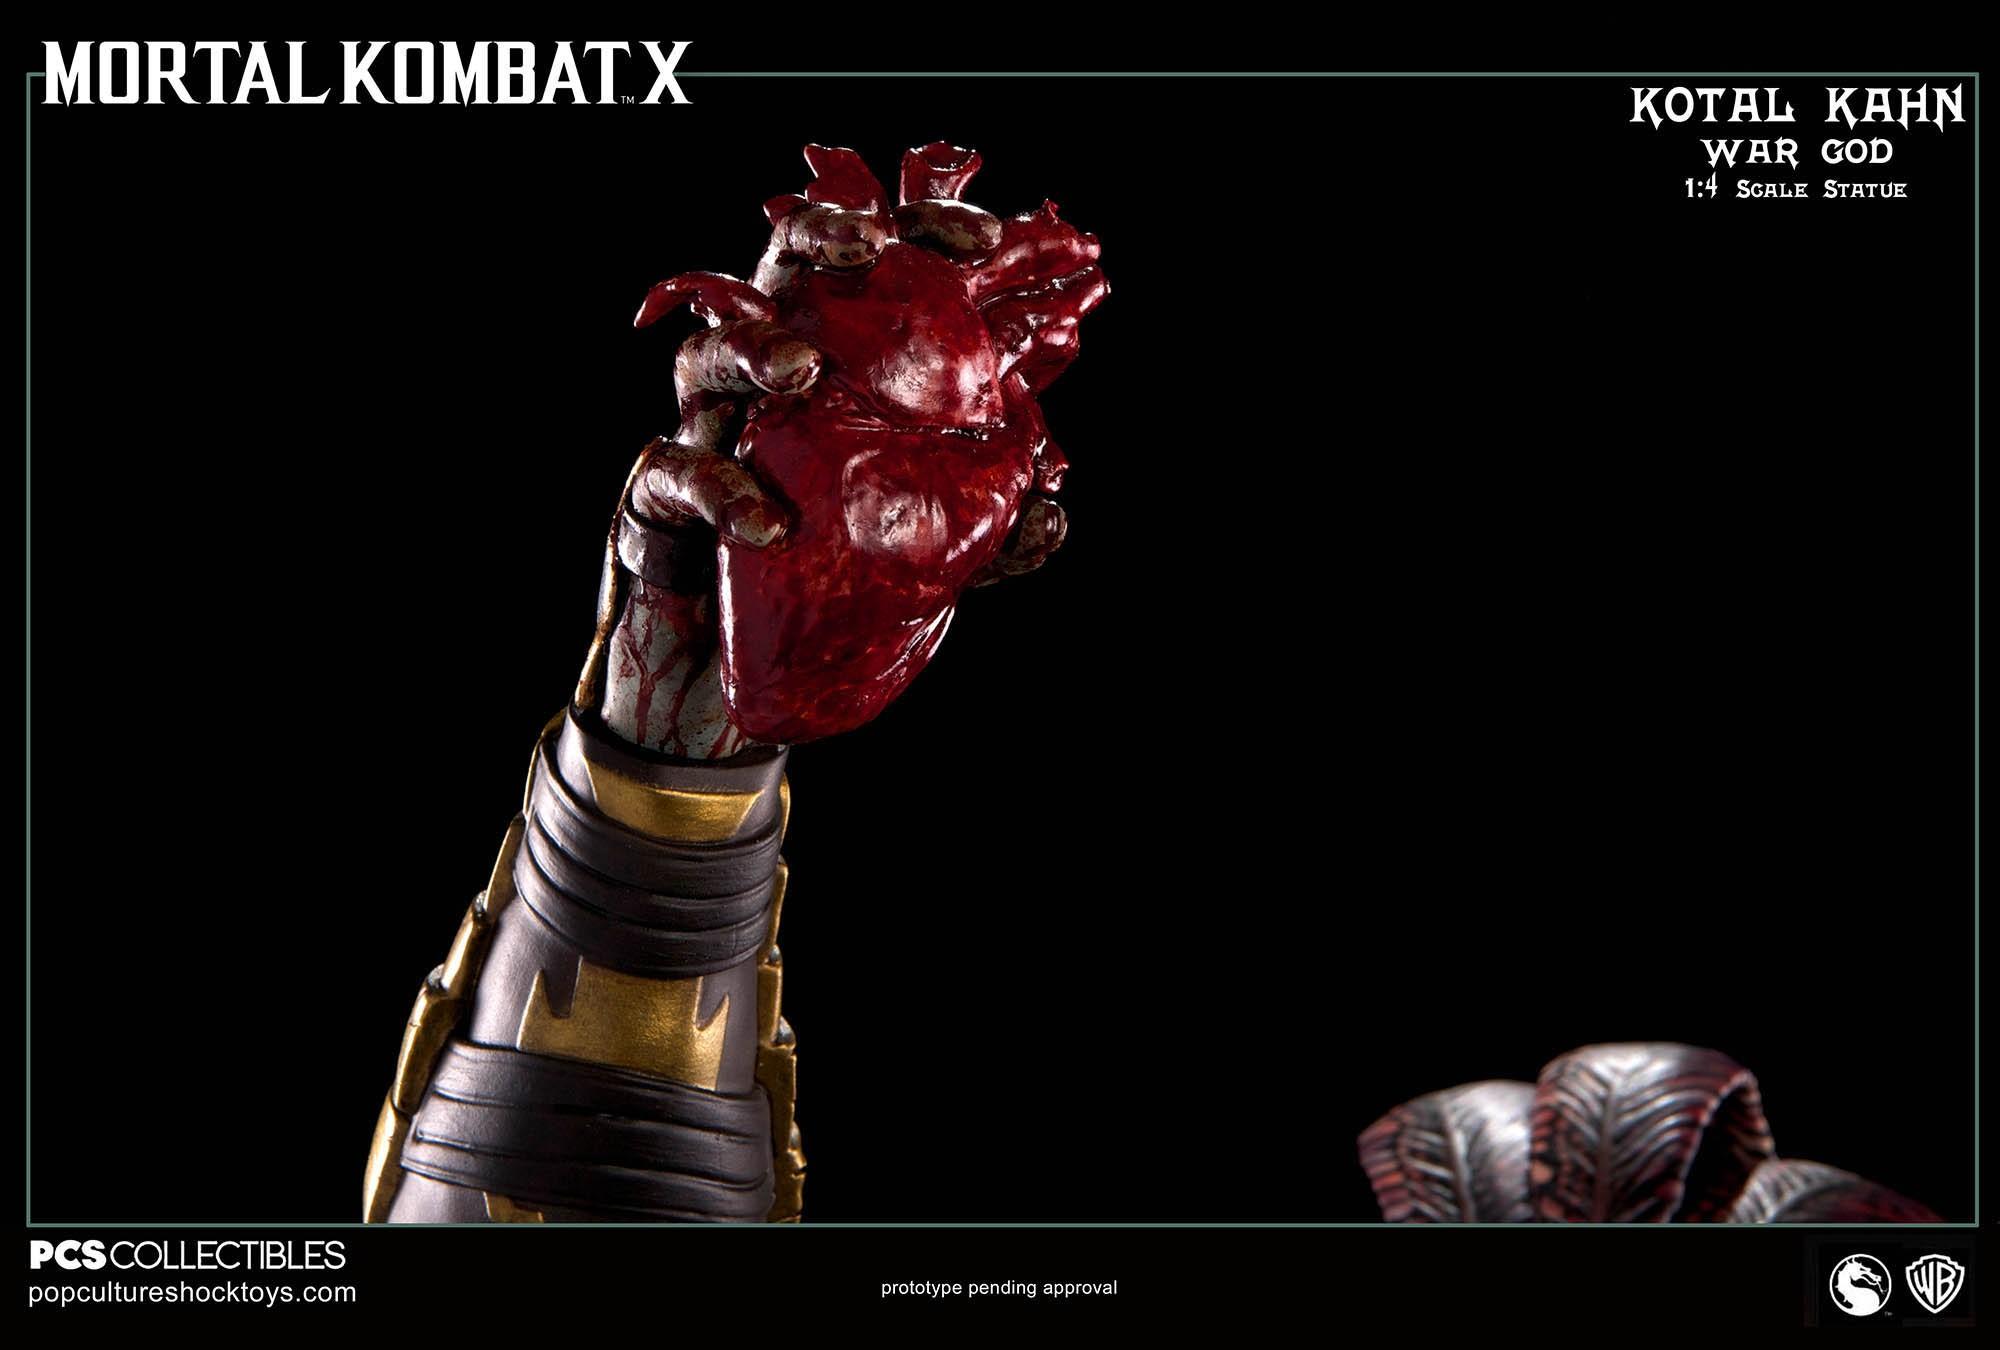 [Pop Culture Shock] Mortal Kombat X: Kotal Kahn 1:4 scale PCS-Kotal-Kahn-War-God-017